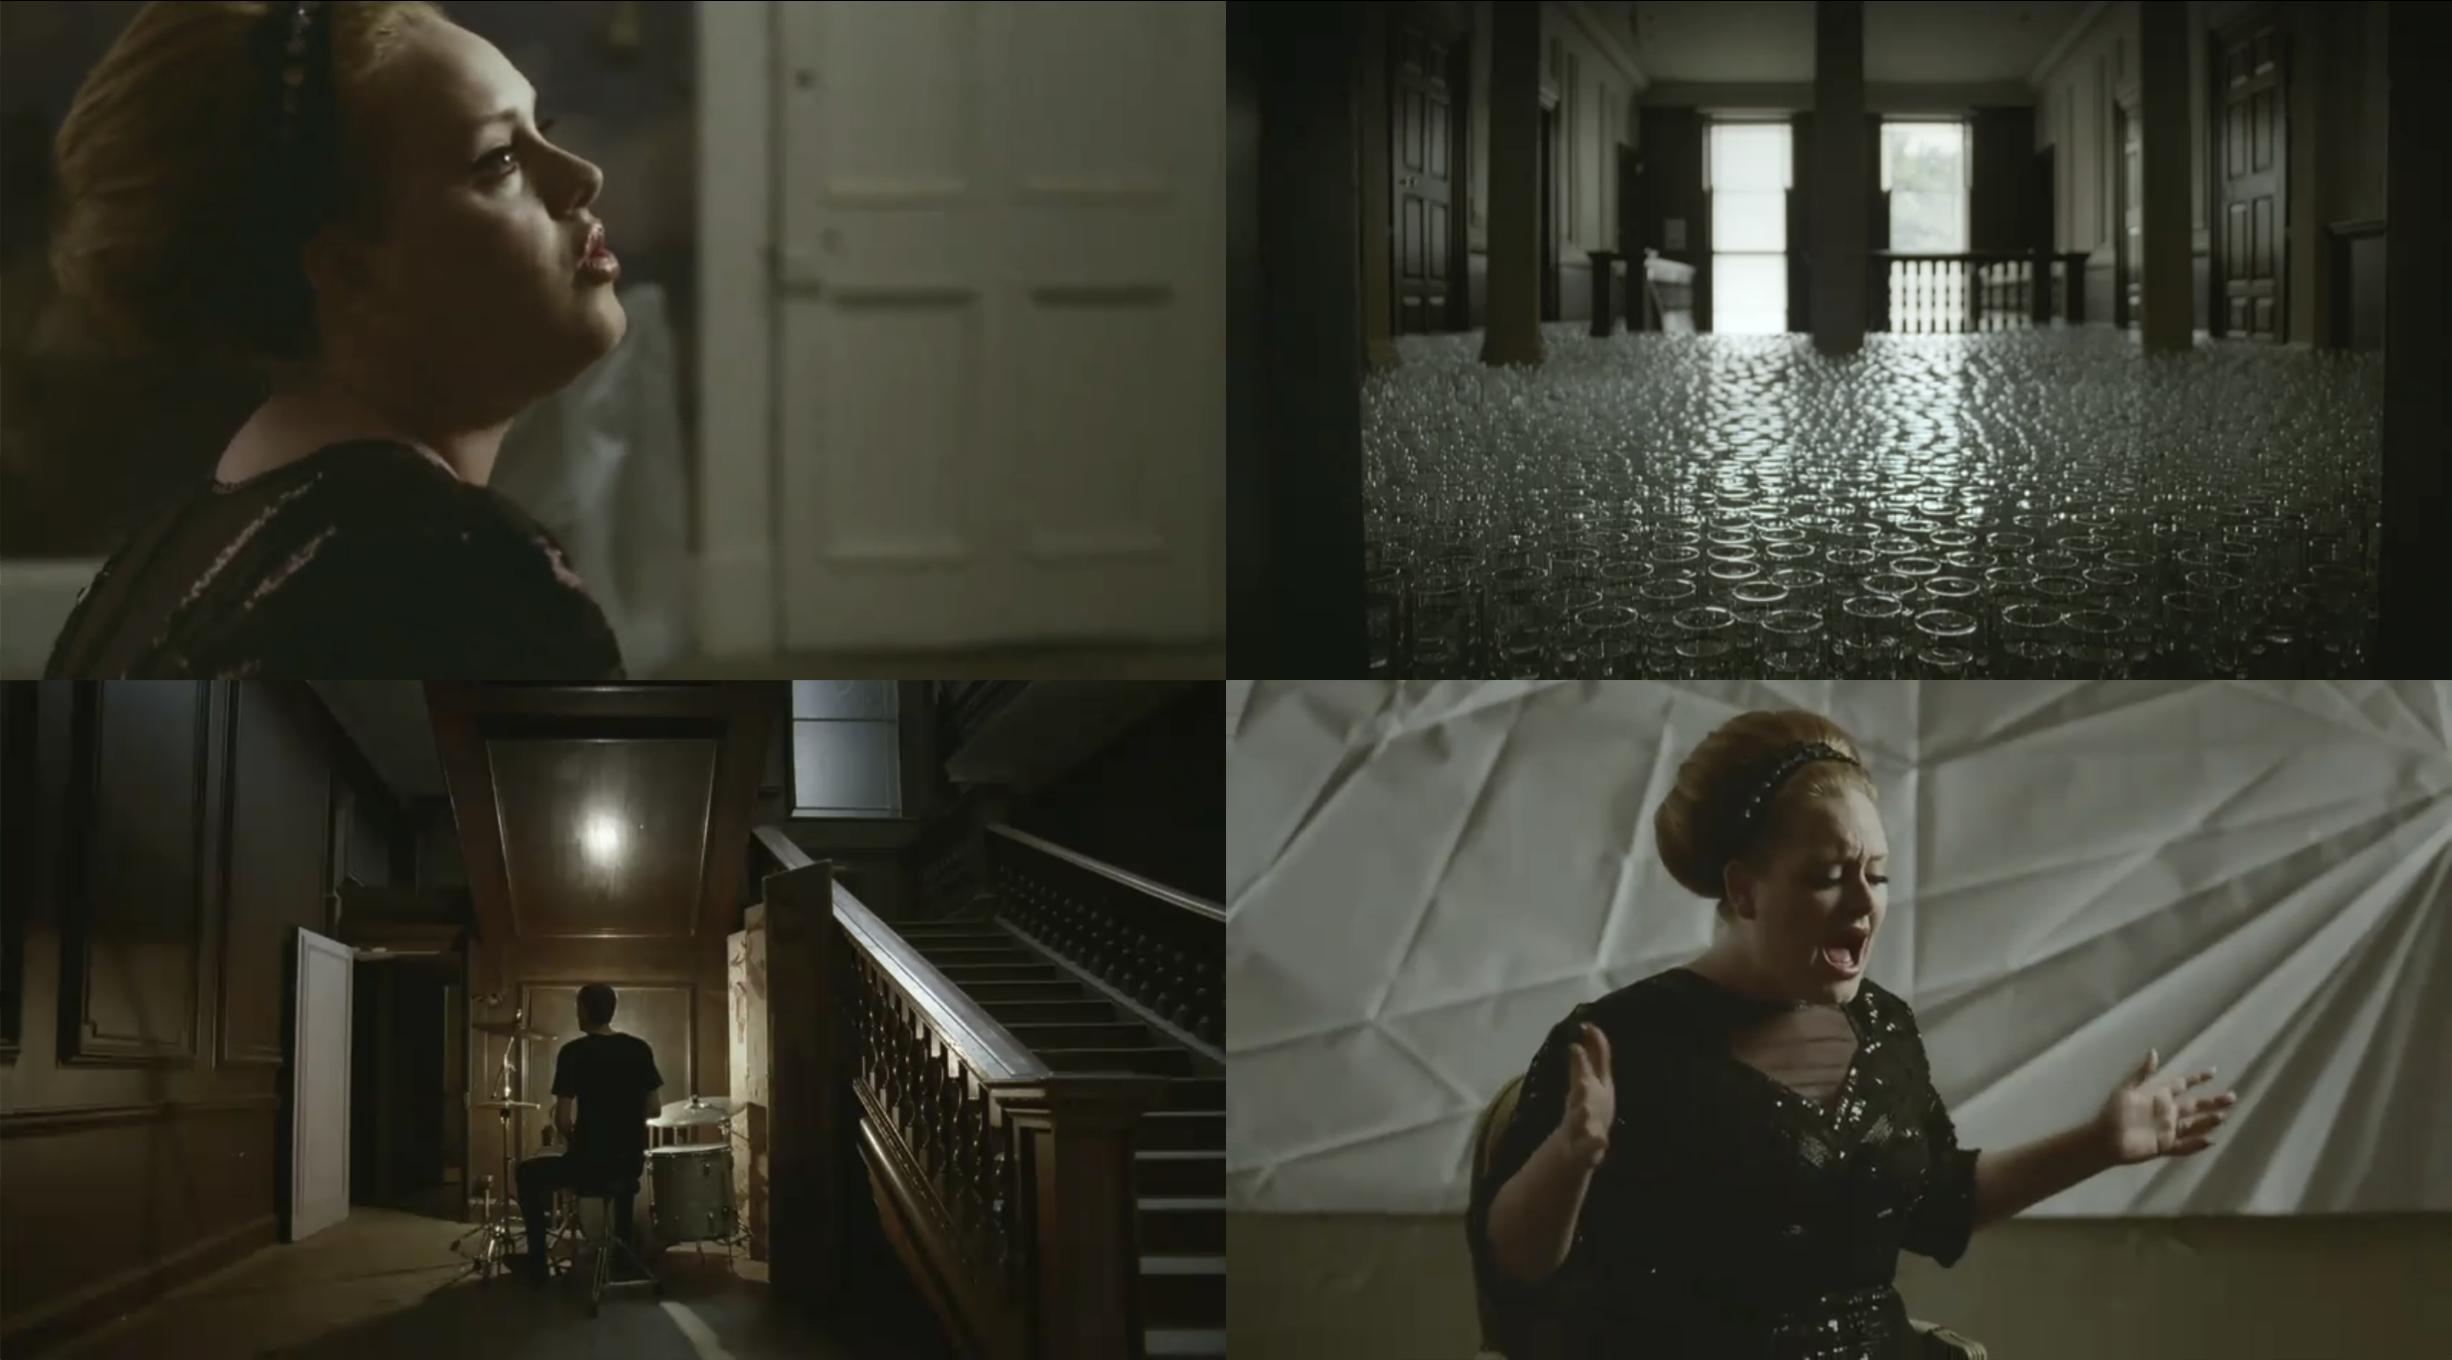 Adele rolling in the deep favorite songs music videos deep time